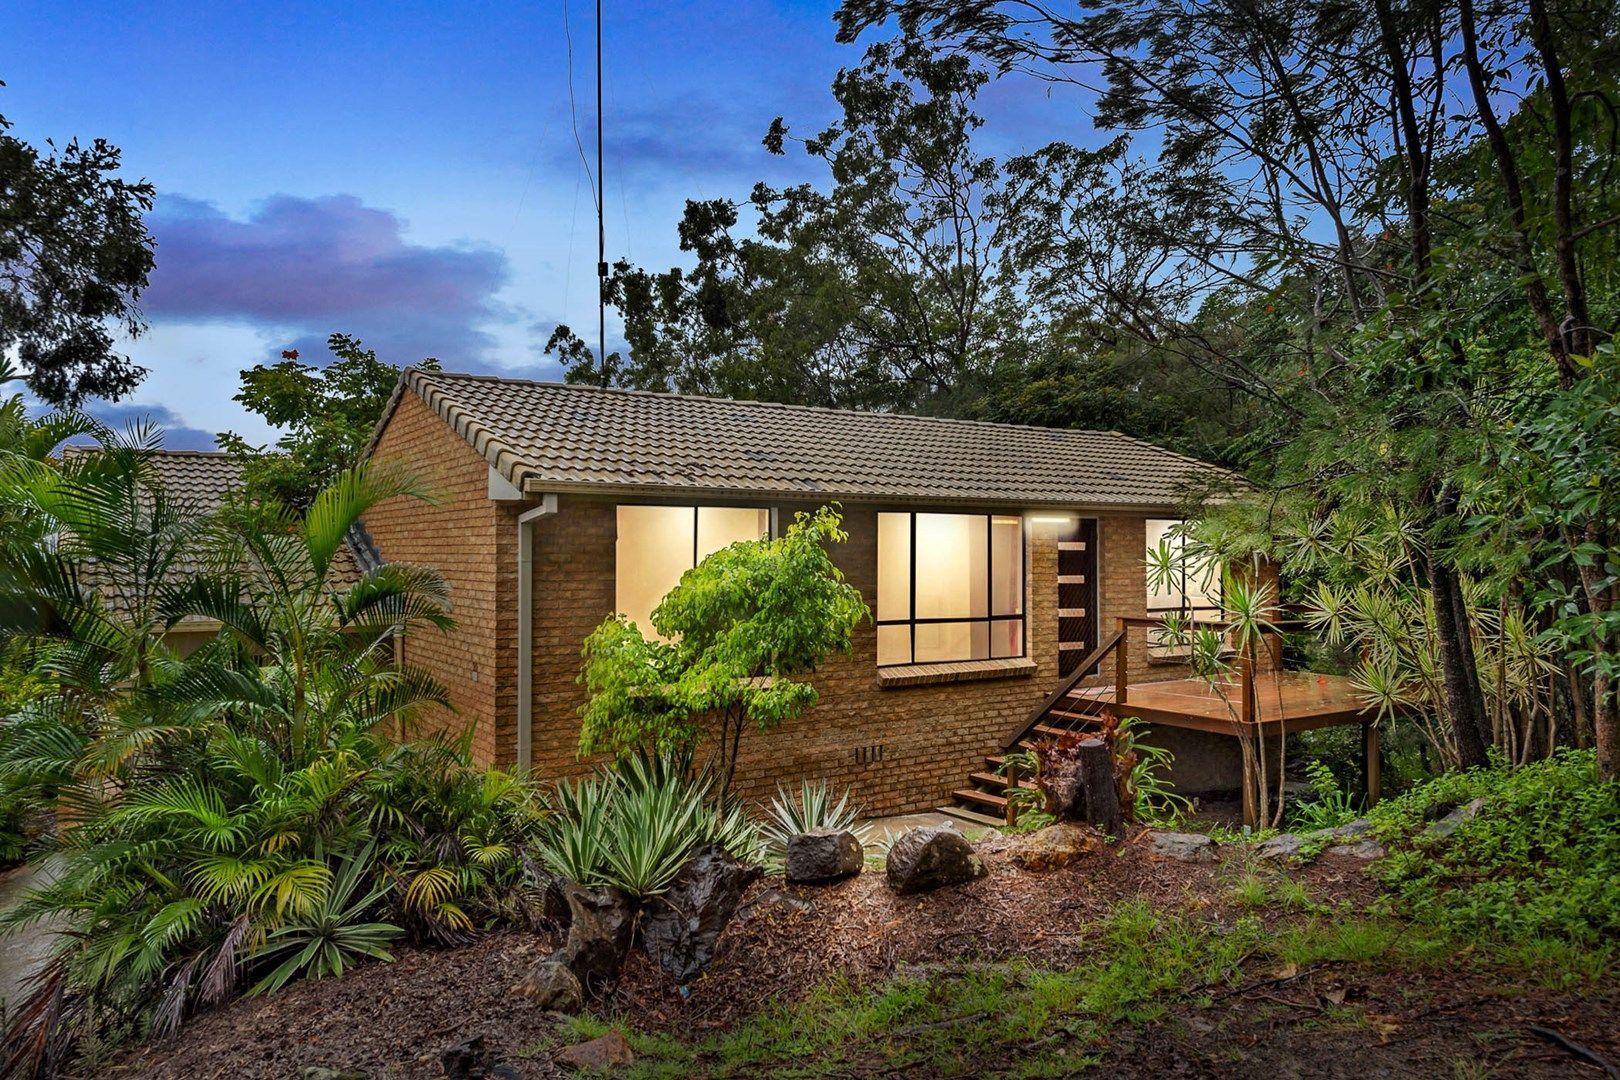 20/24 Cannington Place, Helensvale QLD 4212, Image 0